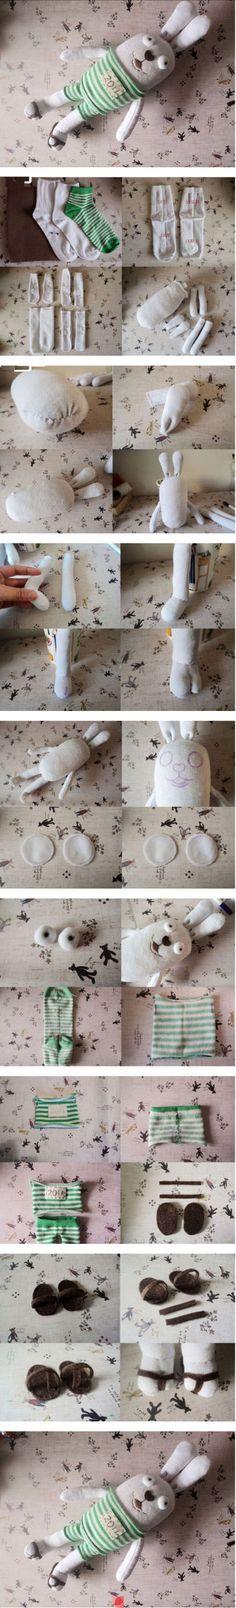 DIY Custom Bunny Plush DIY Projects